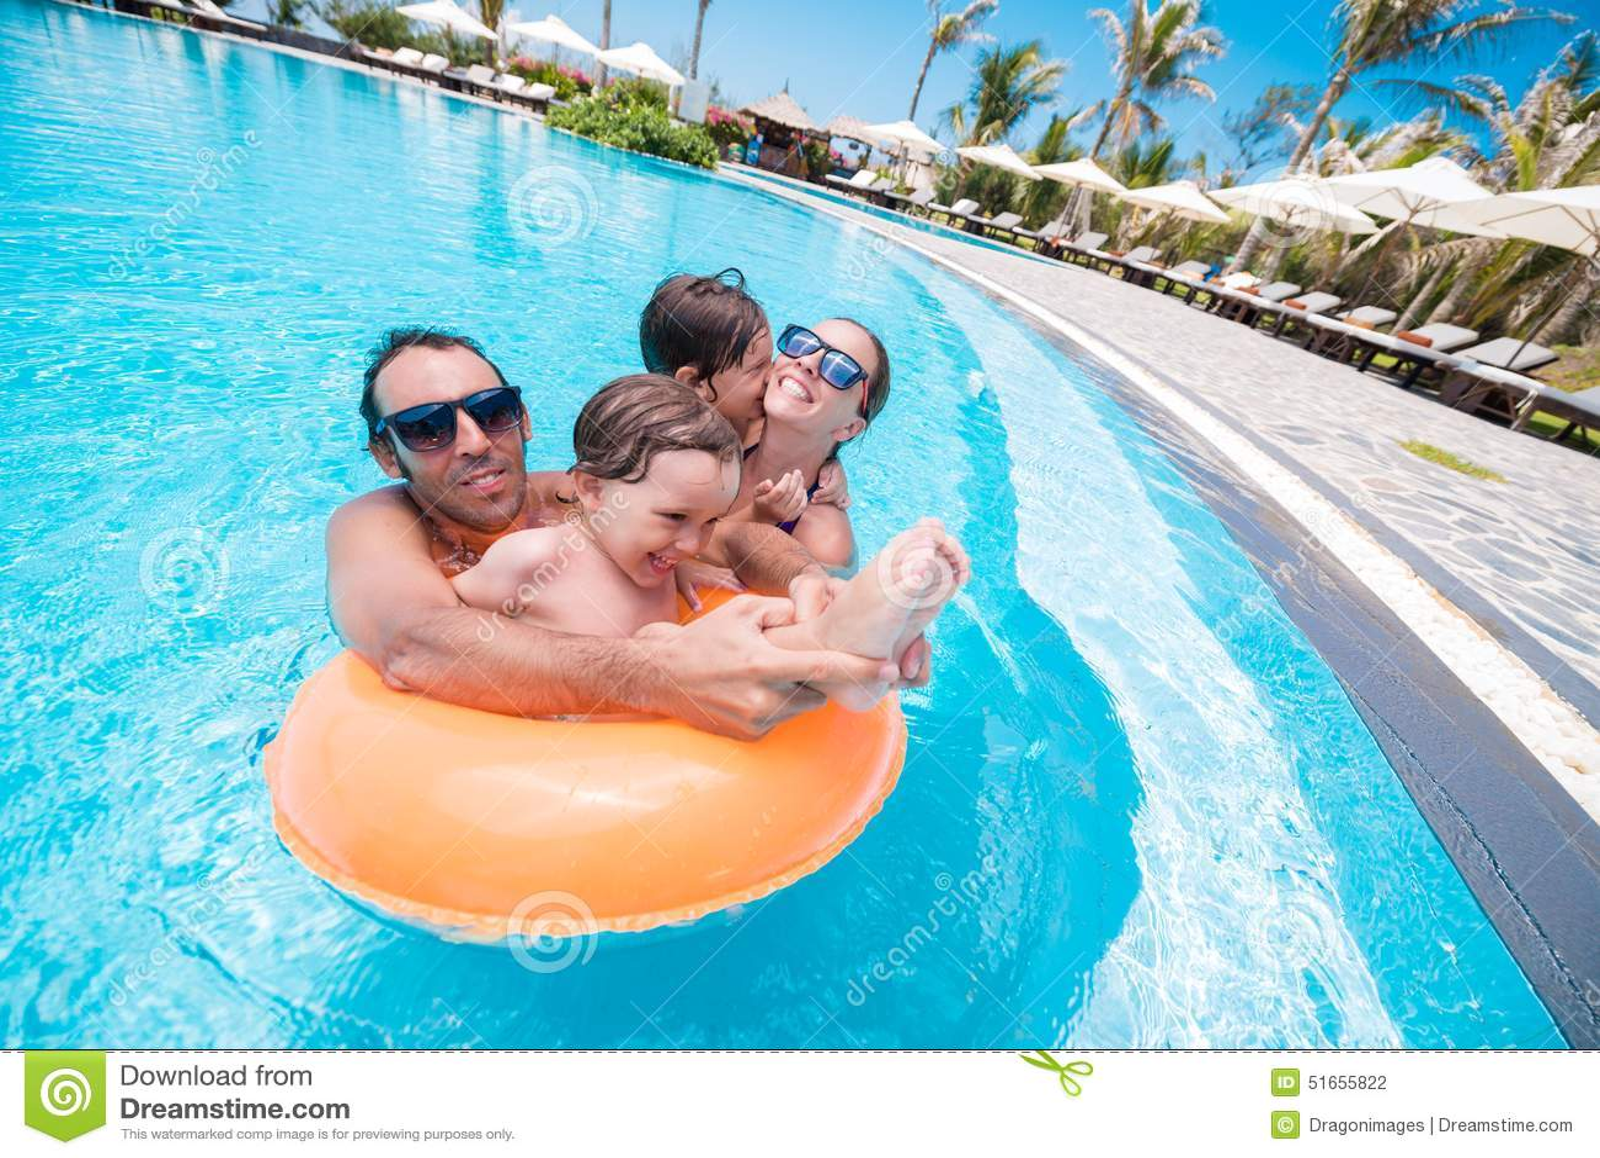 Joyful family in the pool